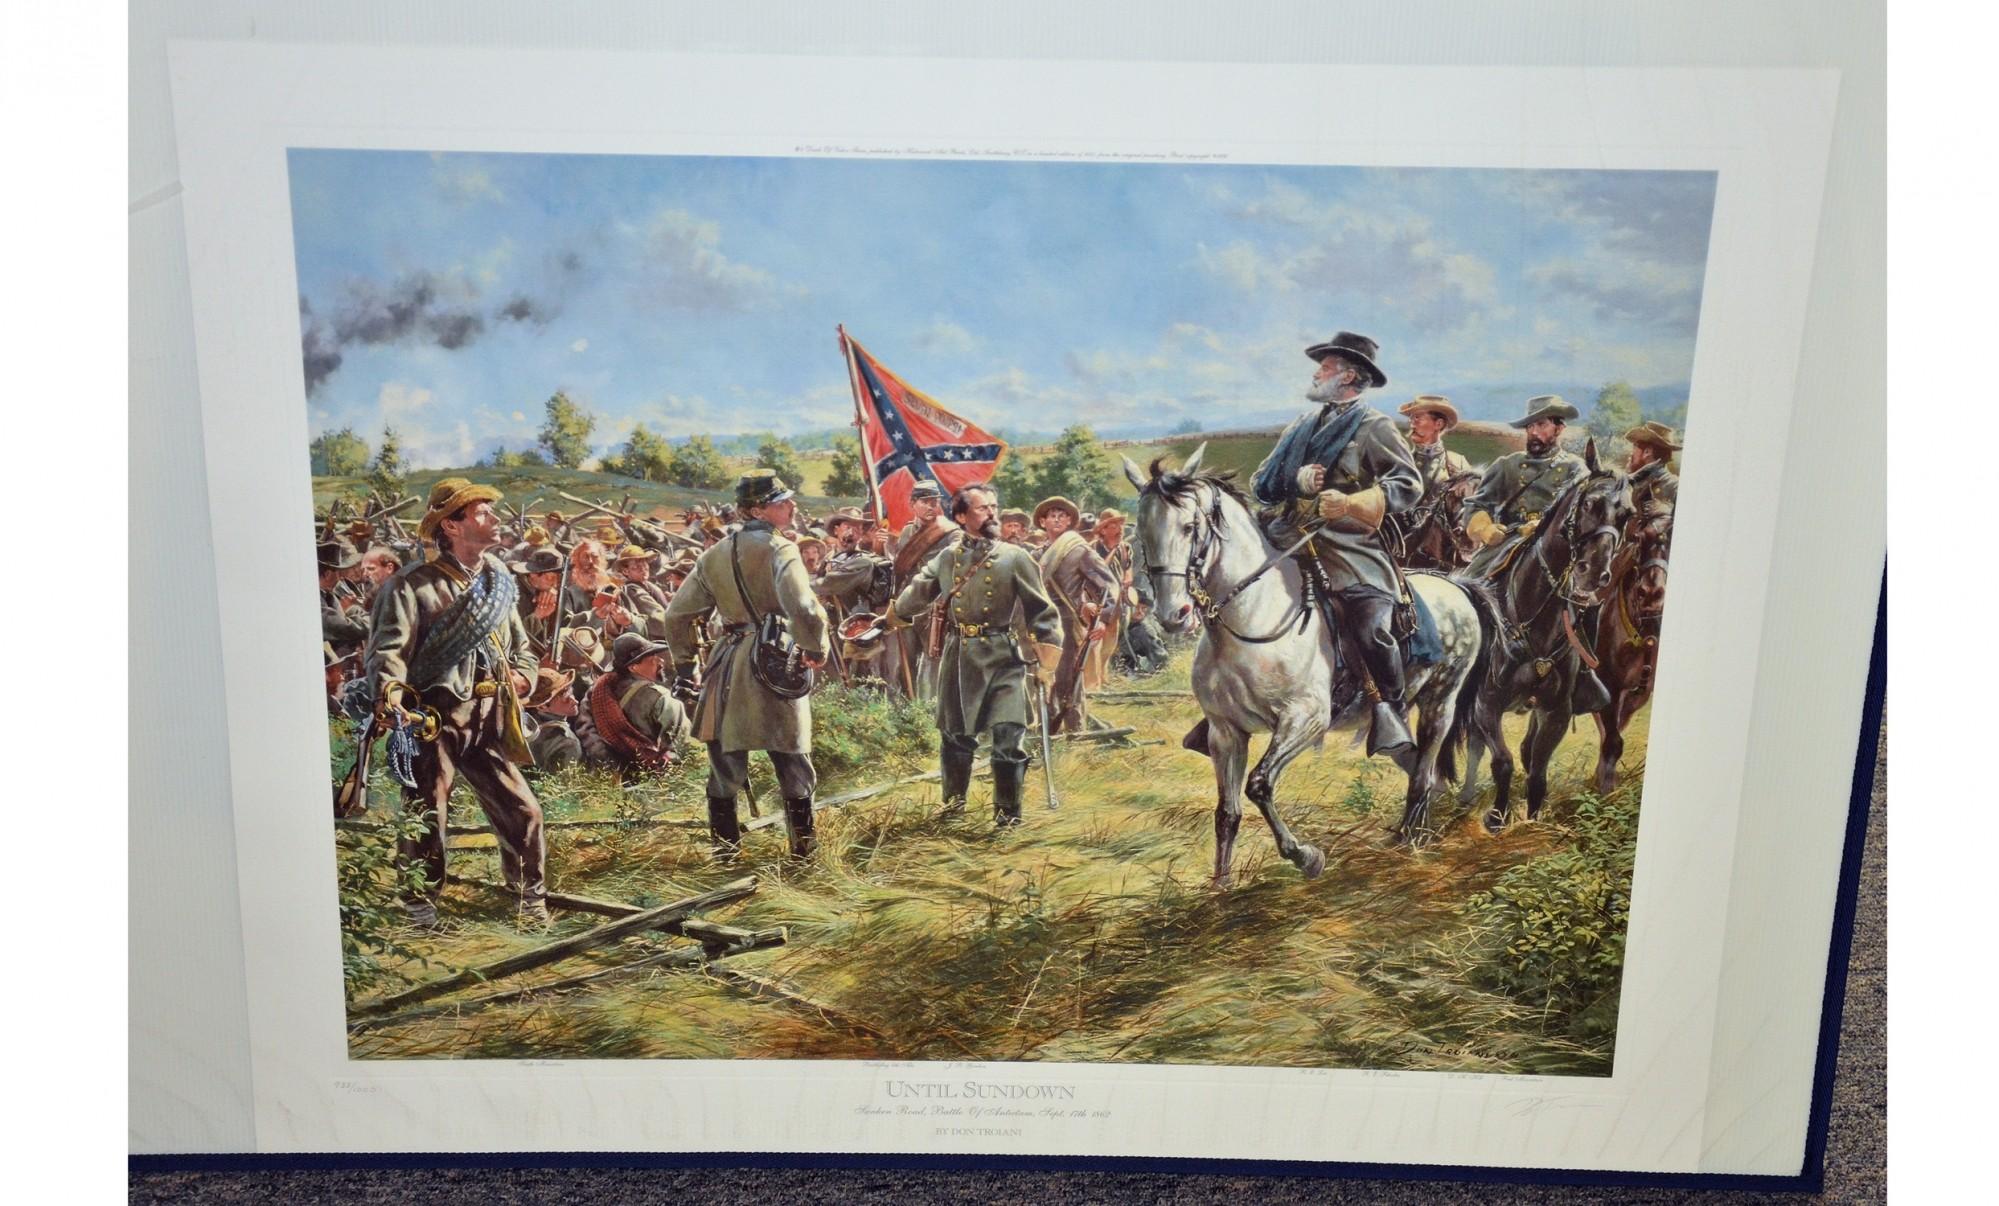 Until Sundown Sunken Road Battle Of Antietam Sept